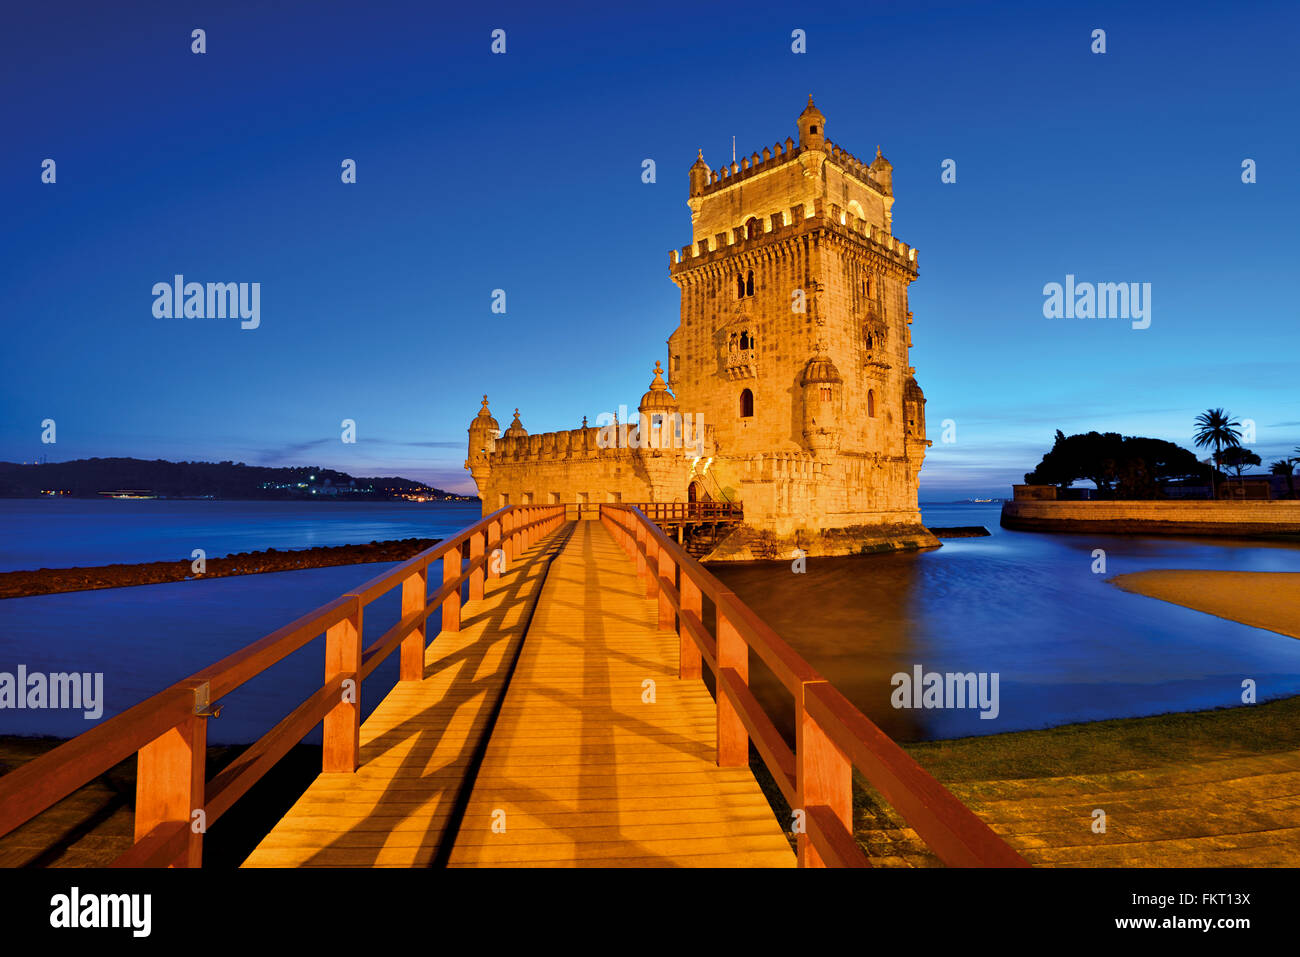 Portugal, Lissabon: Monumentale Turm von Belém bei Nacht Stockbild